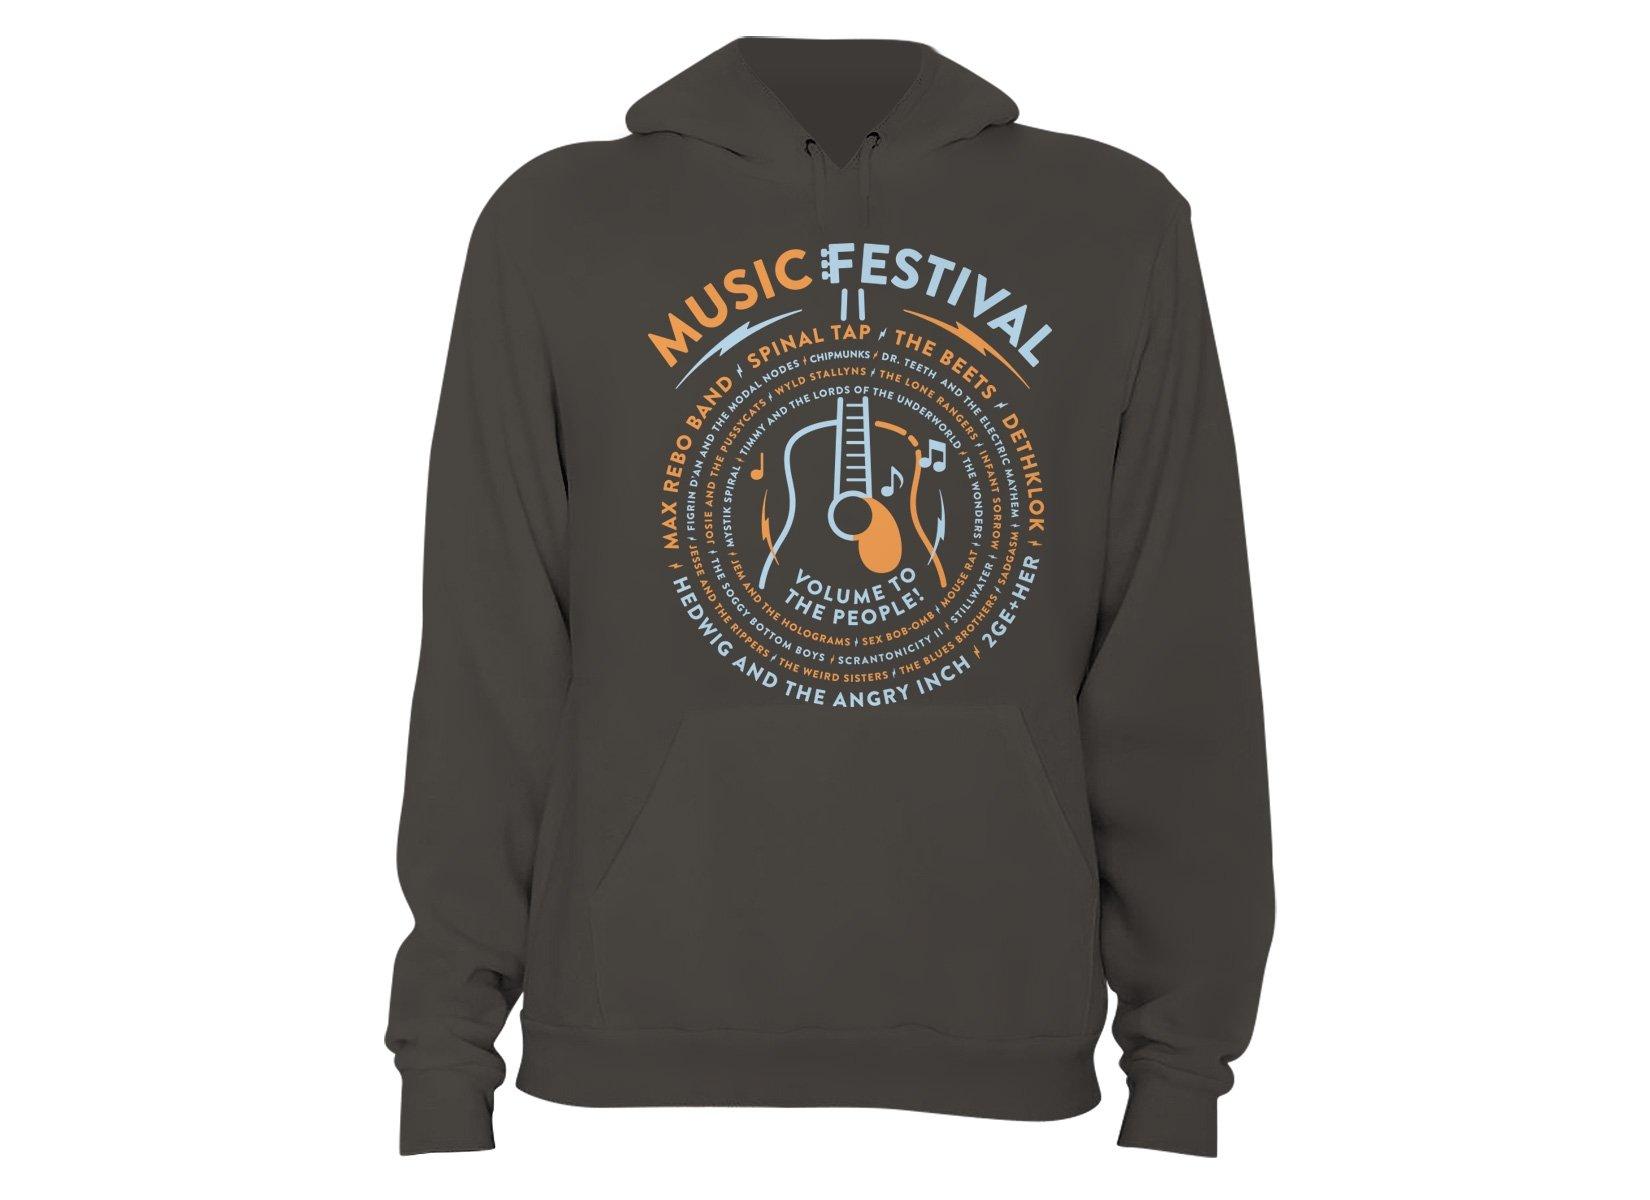 Music Festival on Hoodie